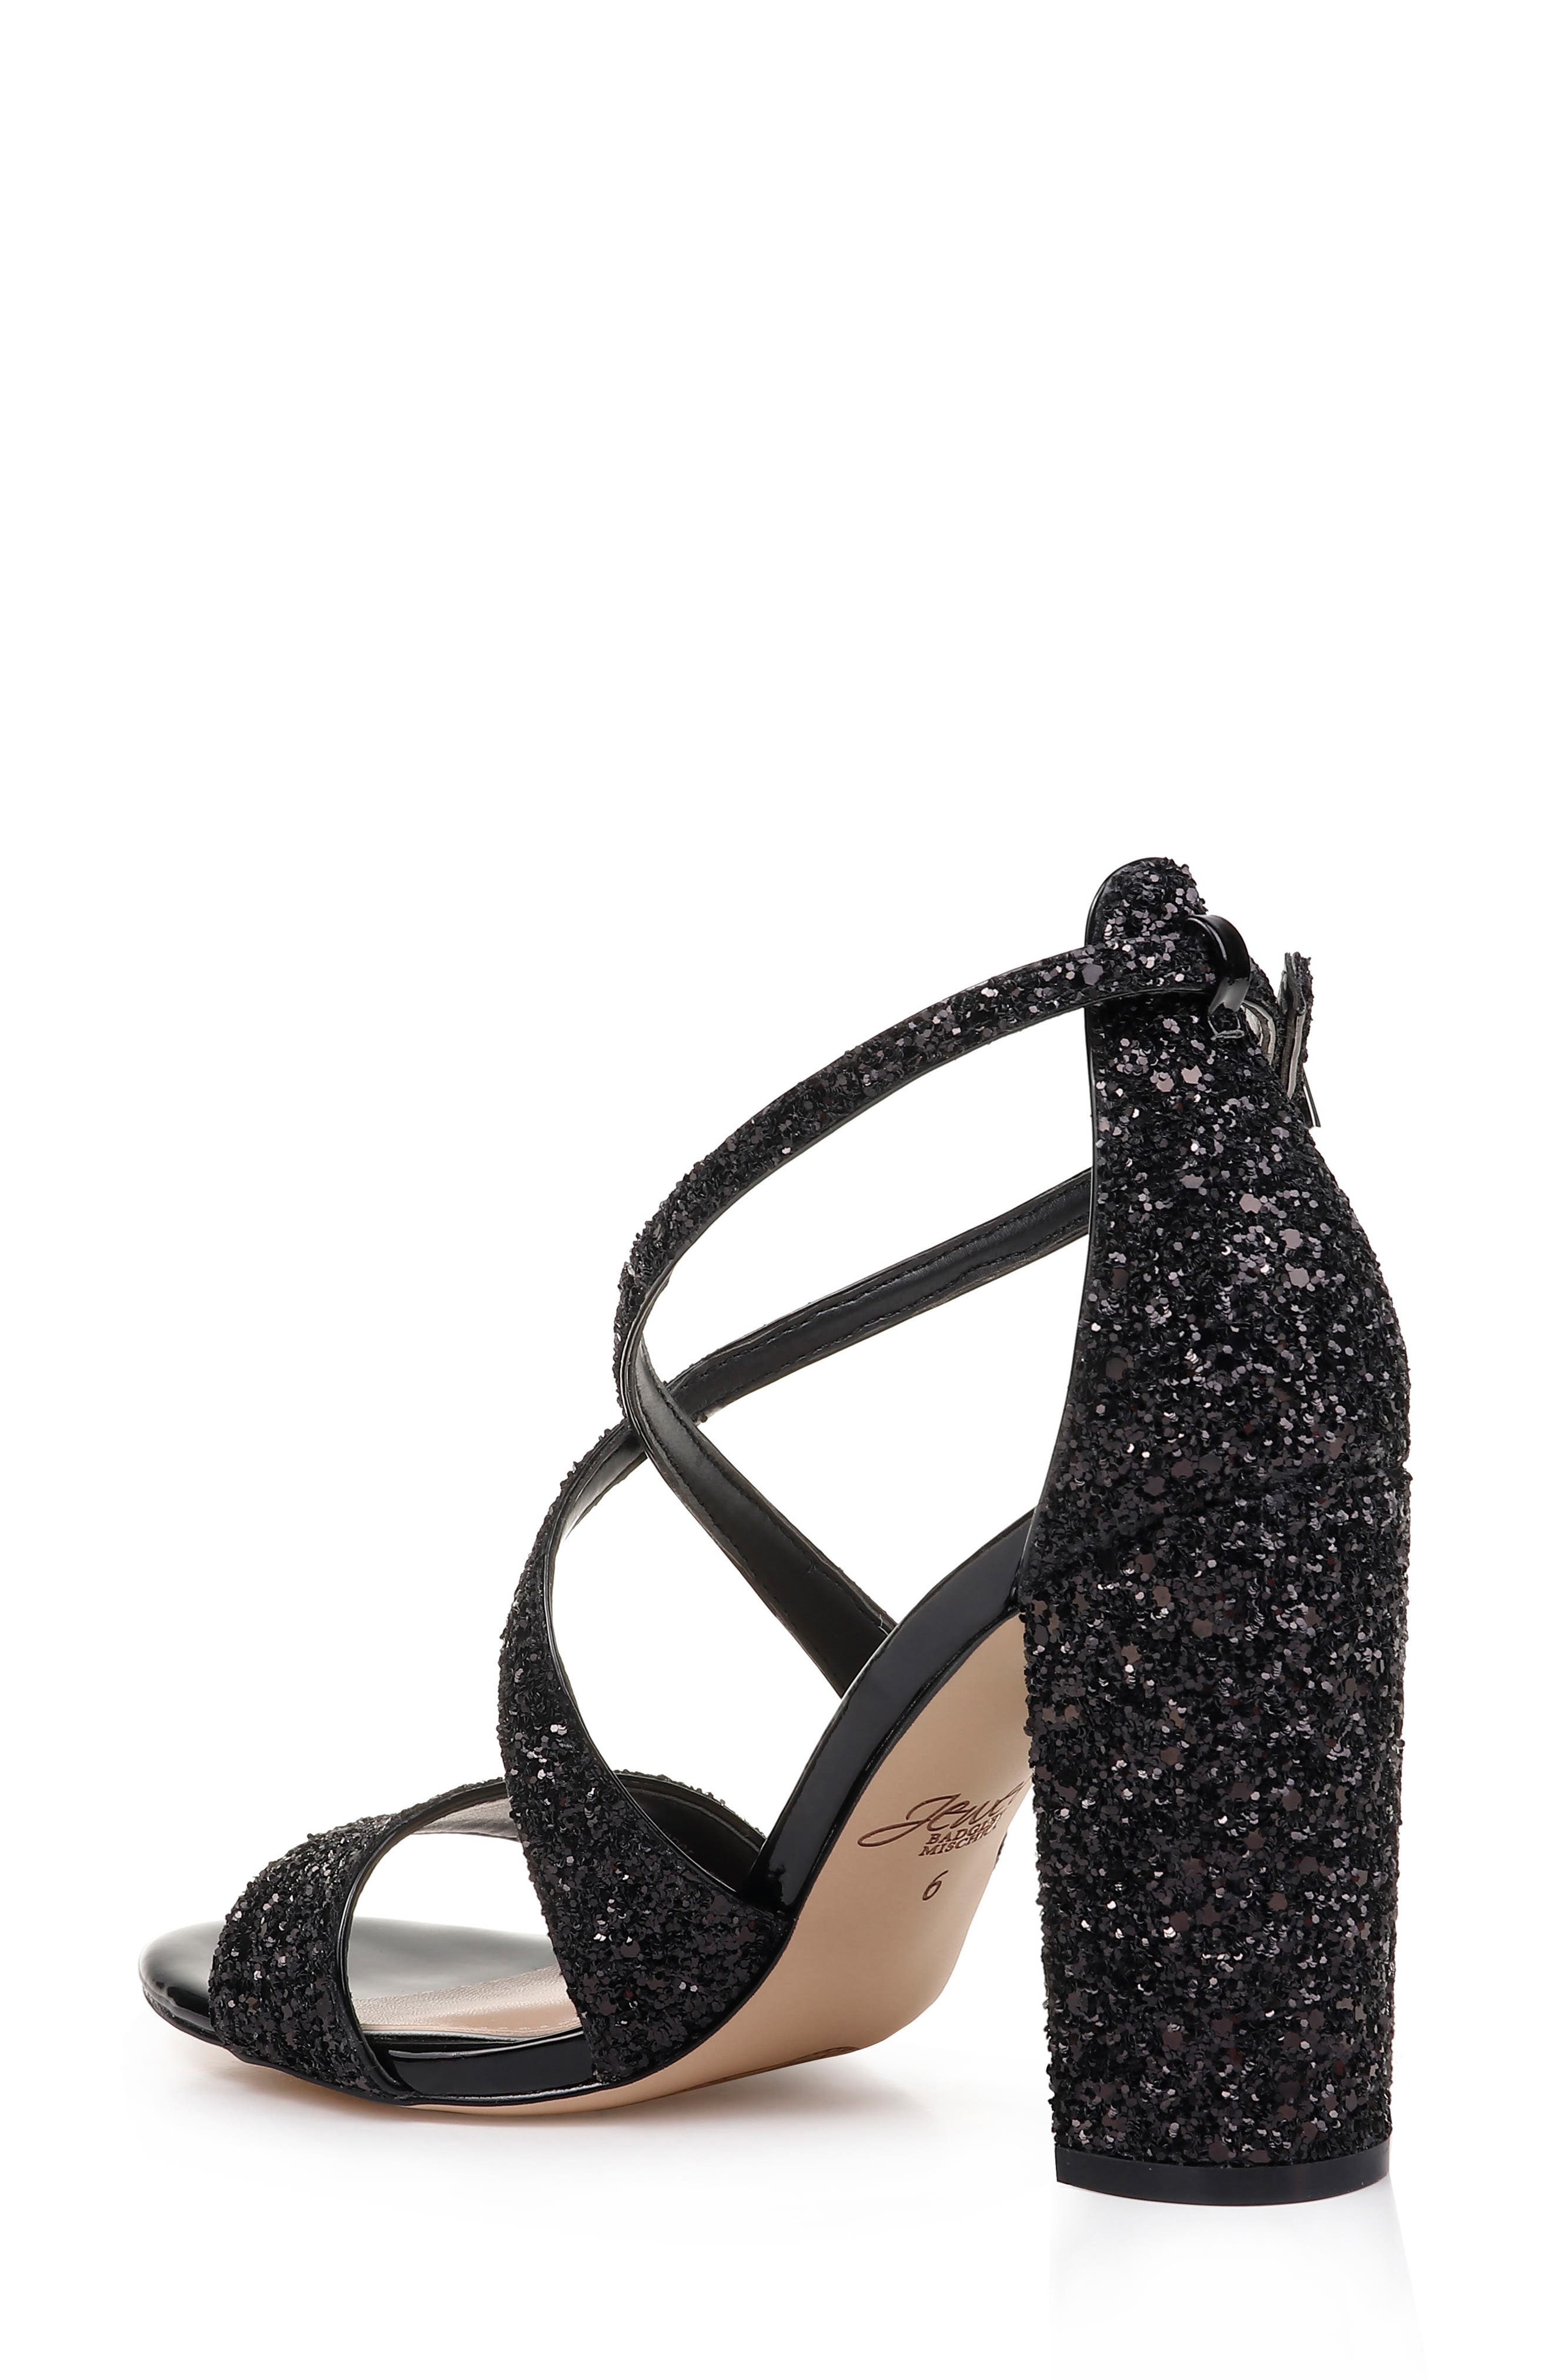 Cook Block Heel Glitter Sandal,                             Alternate thumbnail 2, color,                             BLACK LEATHER